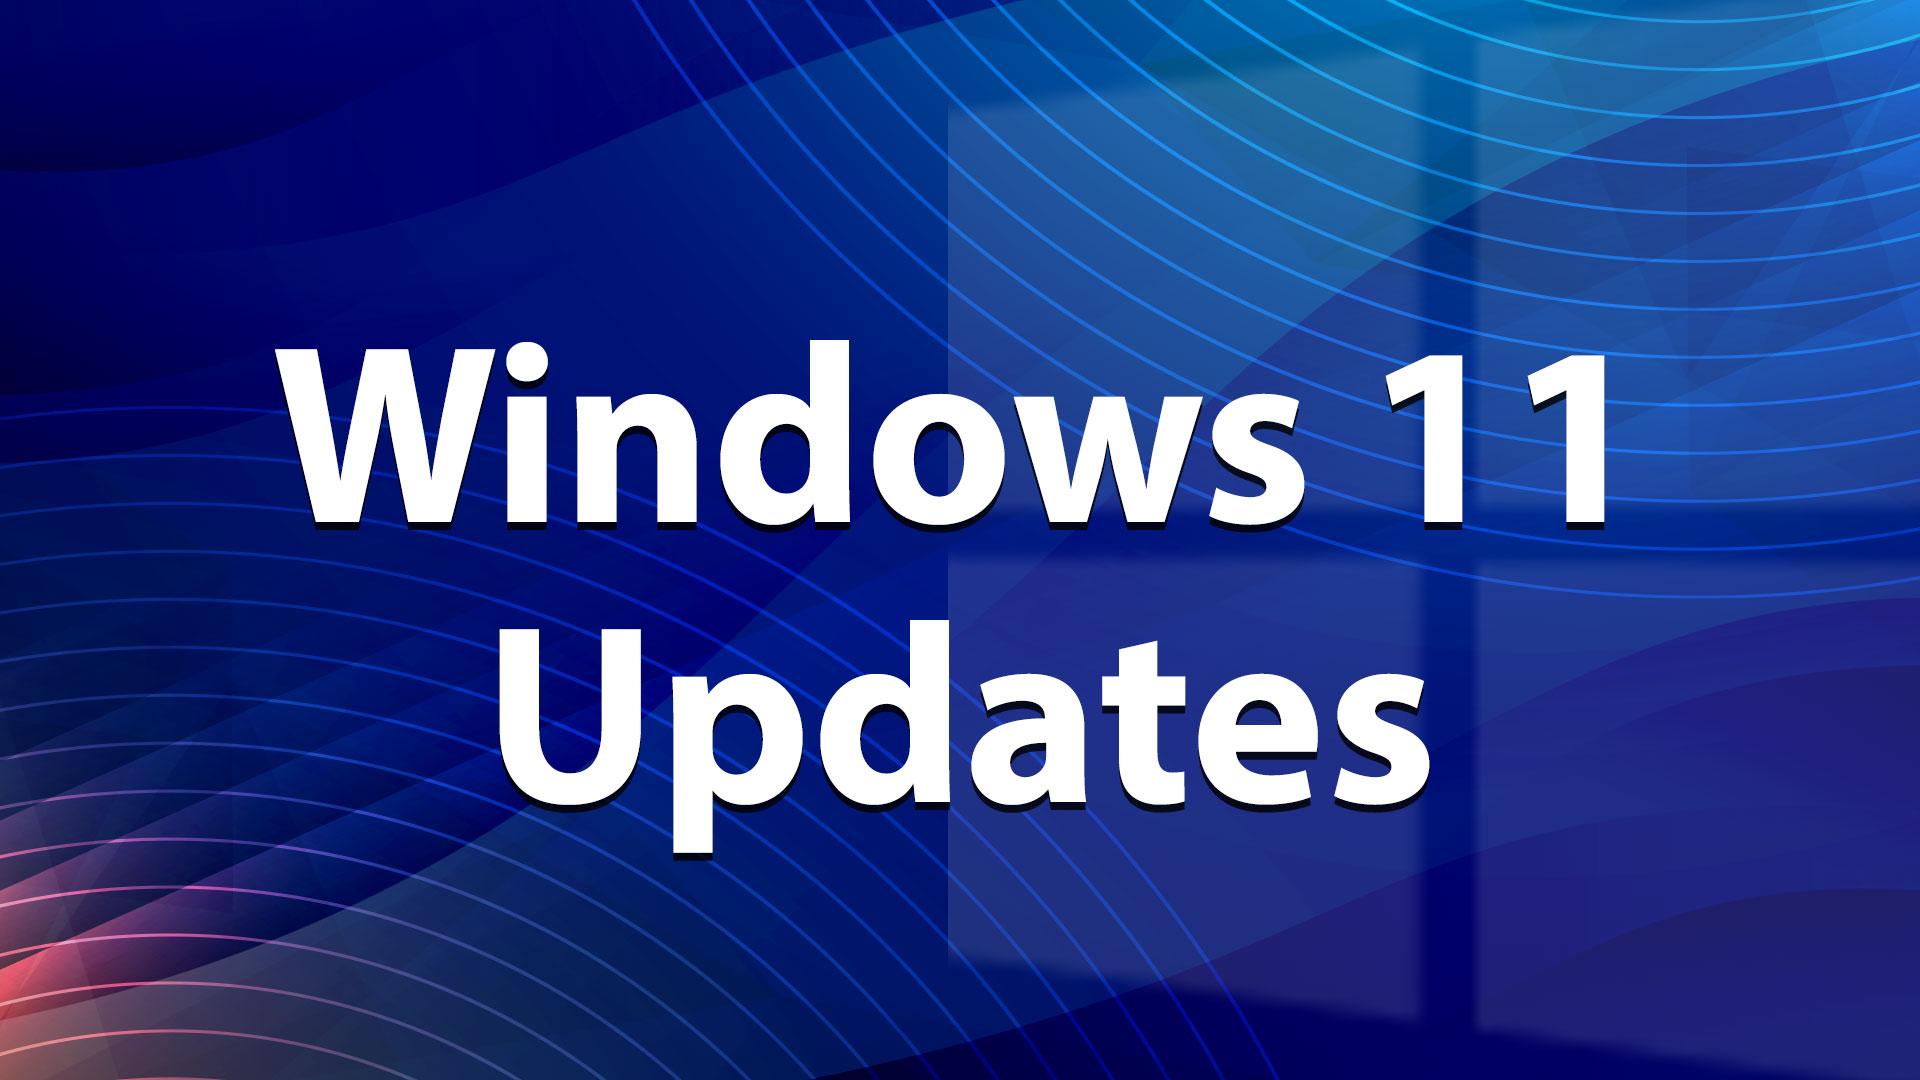 Update, Patch, Updates, Windows 11, Microsoft Windows 11, Windows 11 Update, Windows 11 Updates